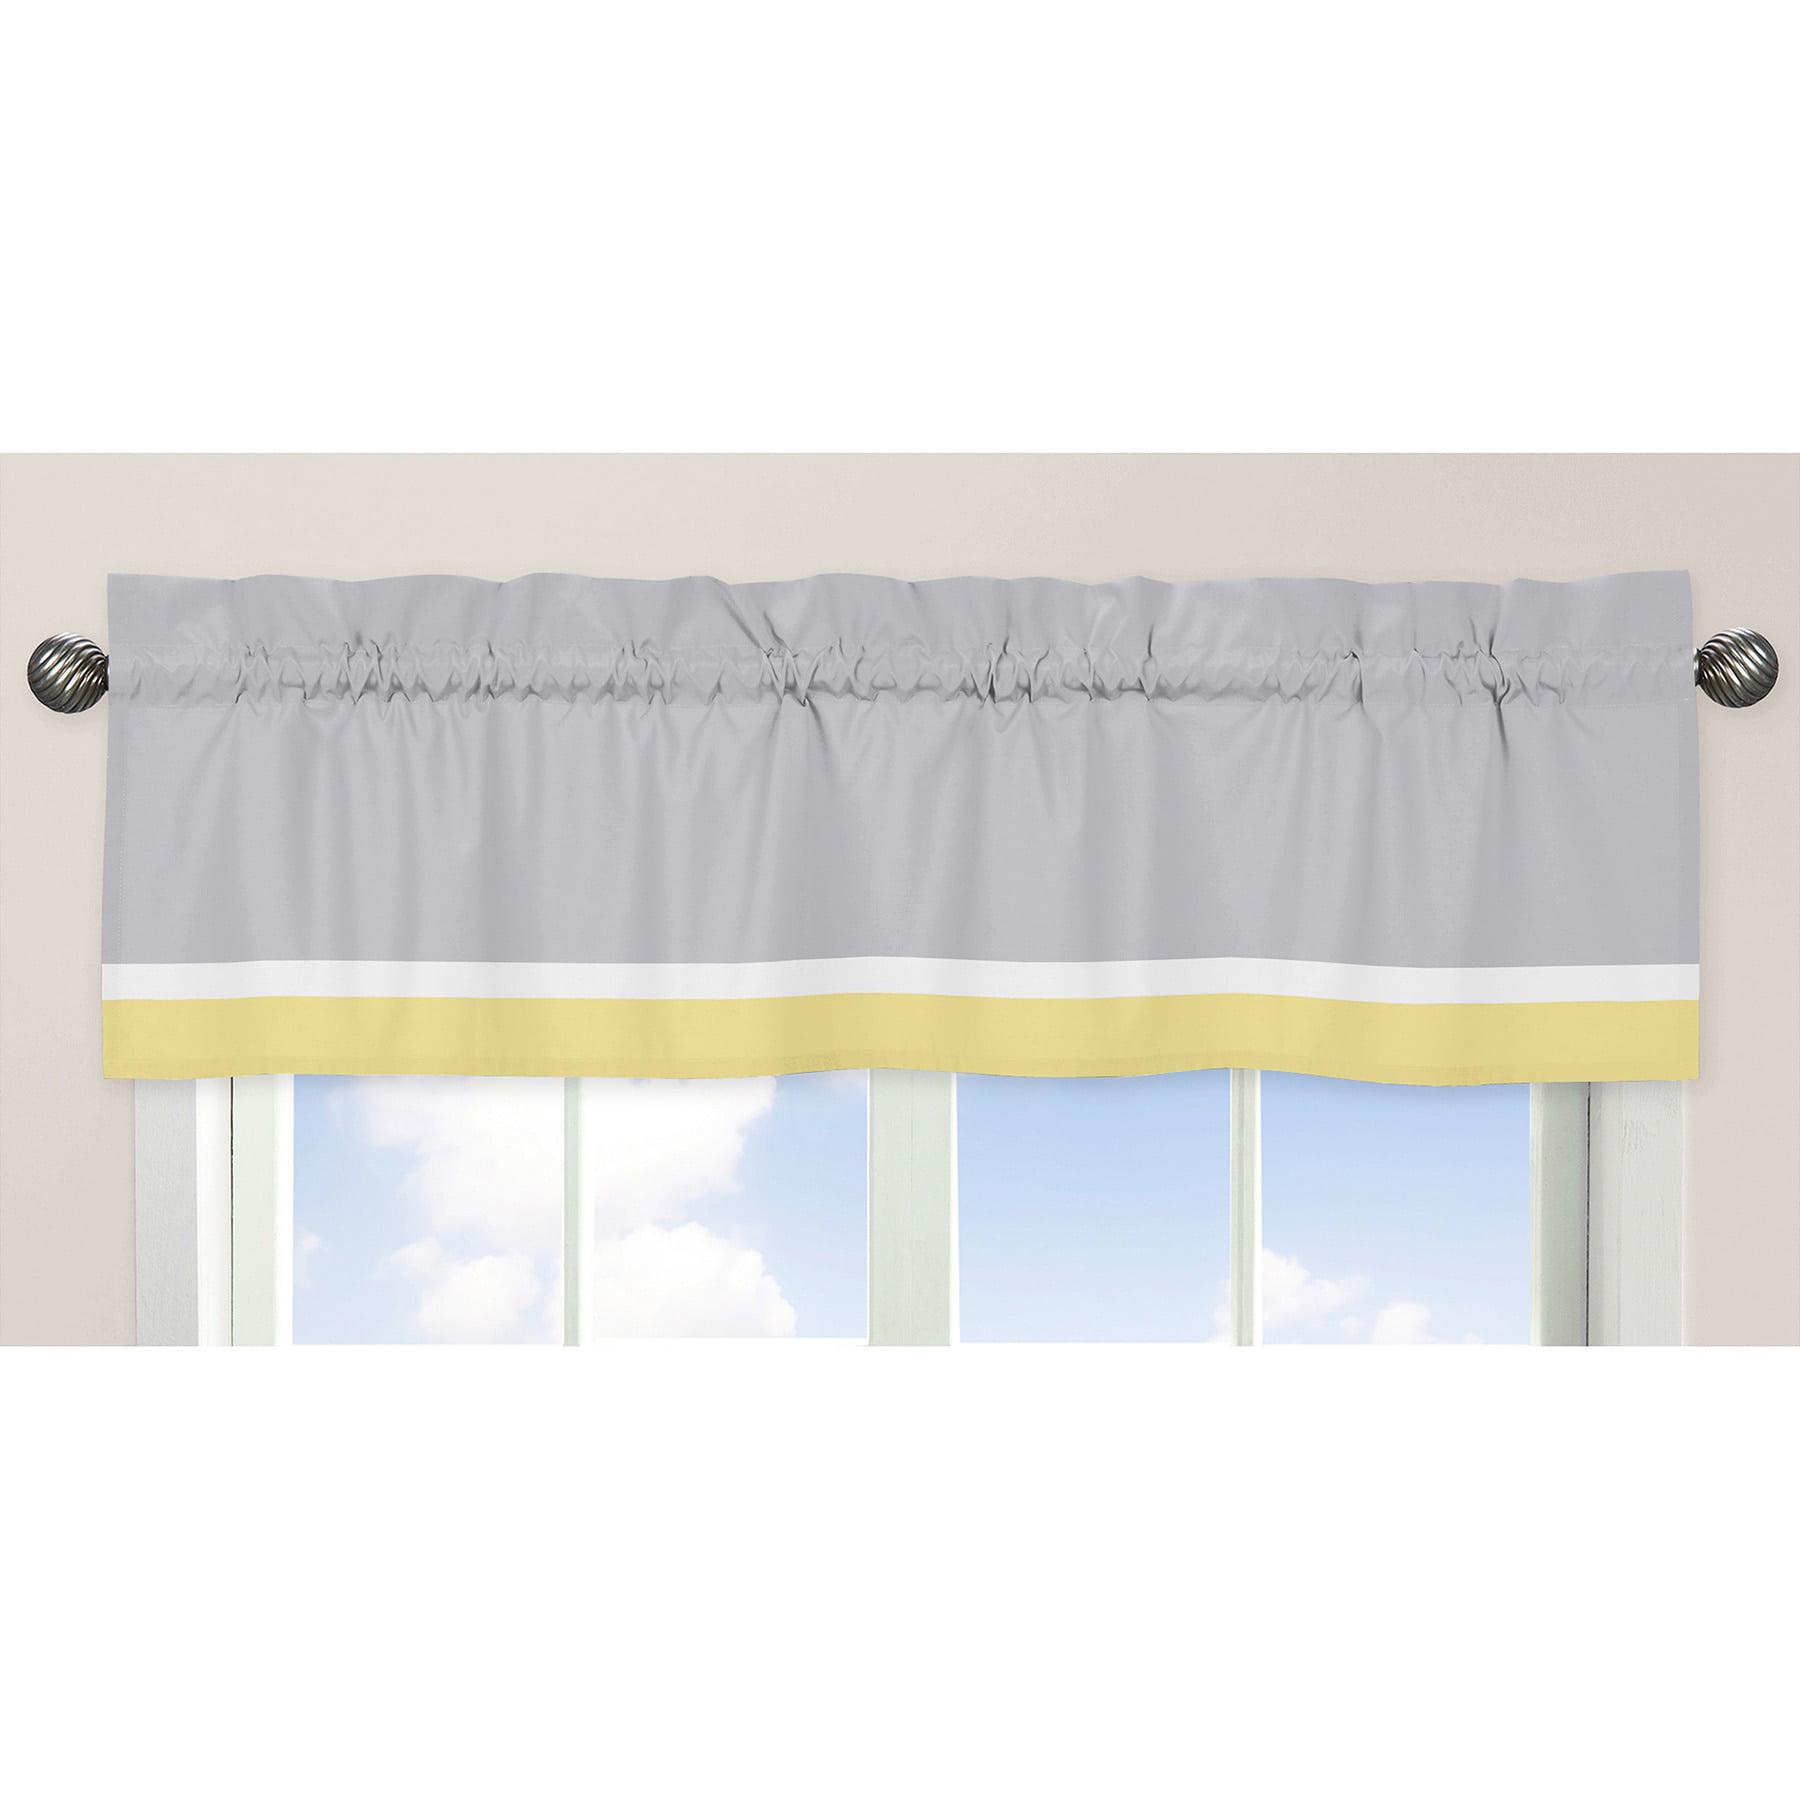 Sweet Jojo Designs Gray Yellow And White 54 Inch X 15 Inch Window Treatment Curtain Valance For Mod Garden Walmart Com Walmart Com